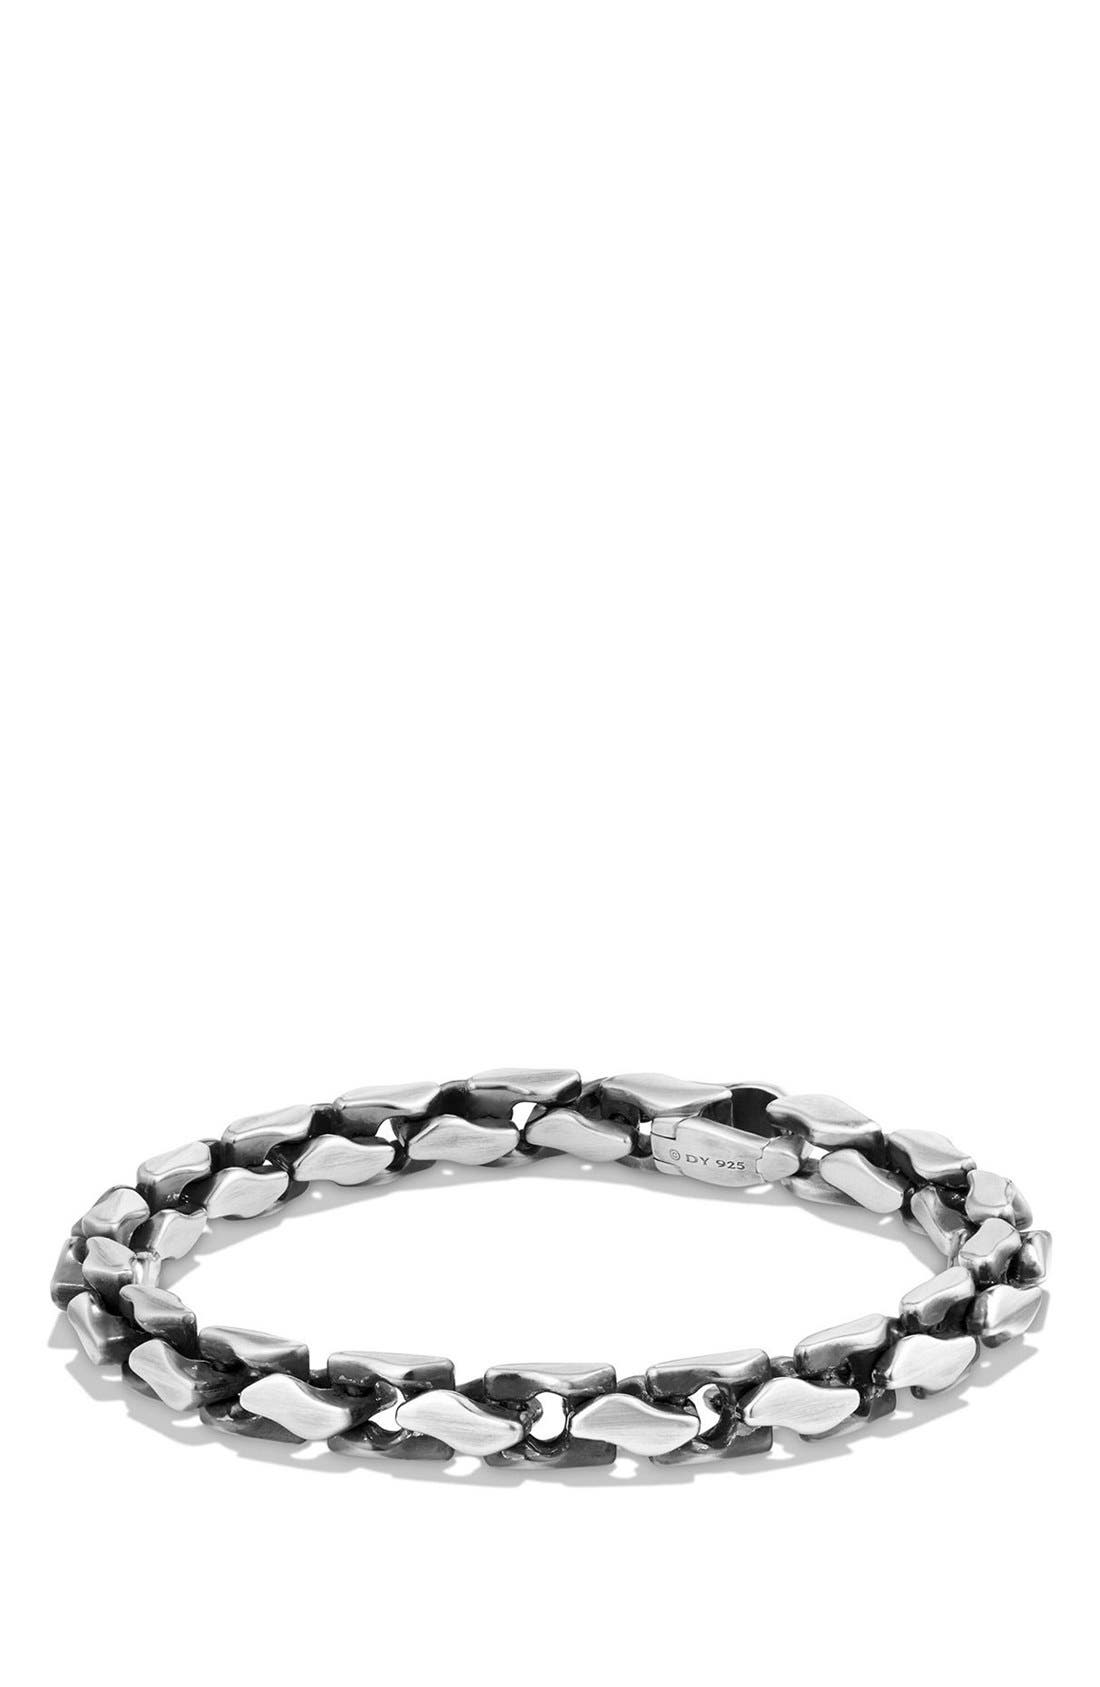 Alternate Image 1 Selected - David Yurman 'Chain Collection' Bracelet